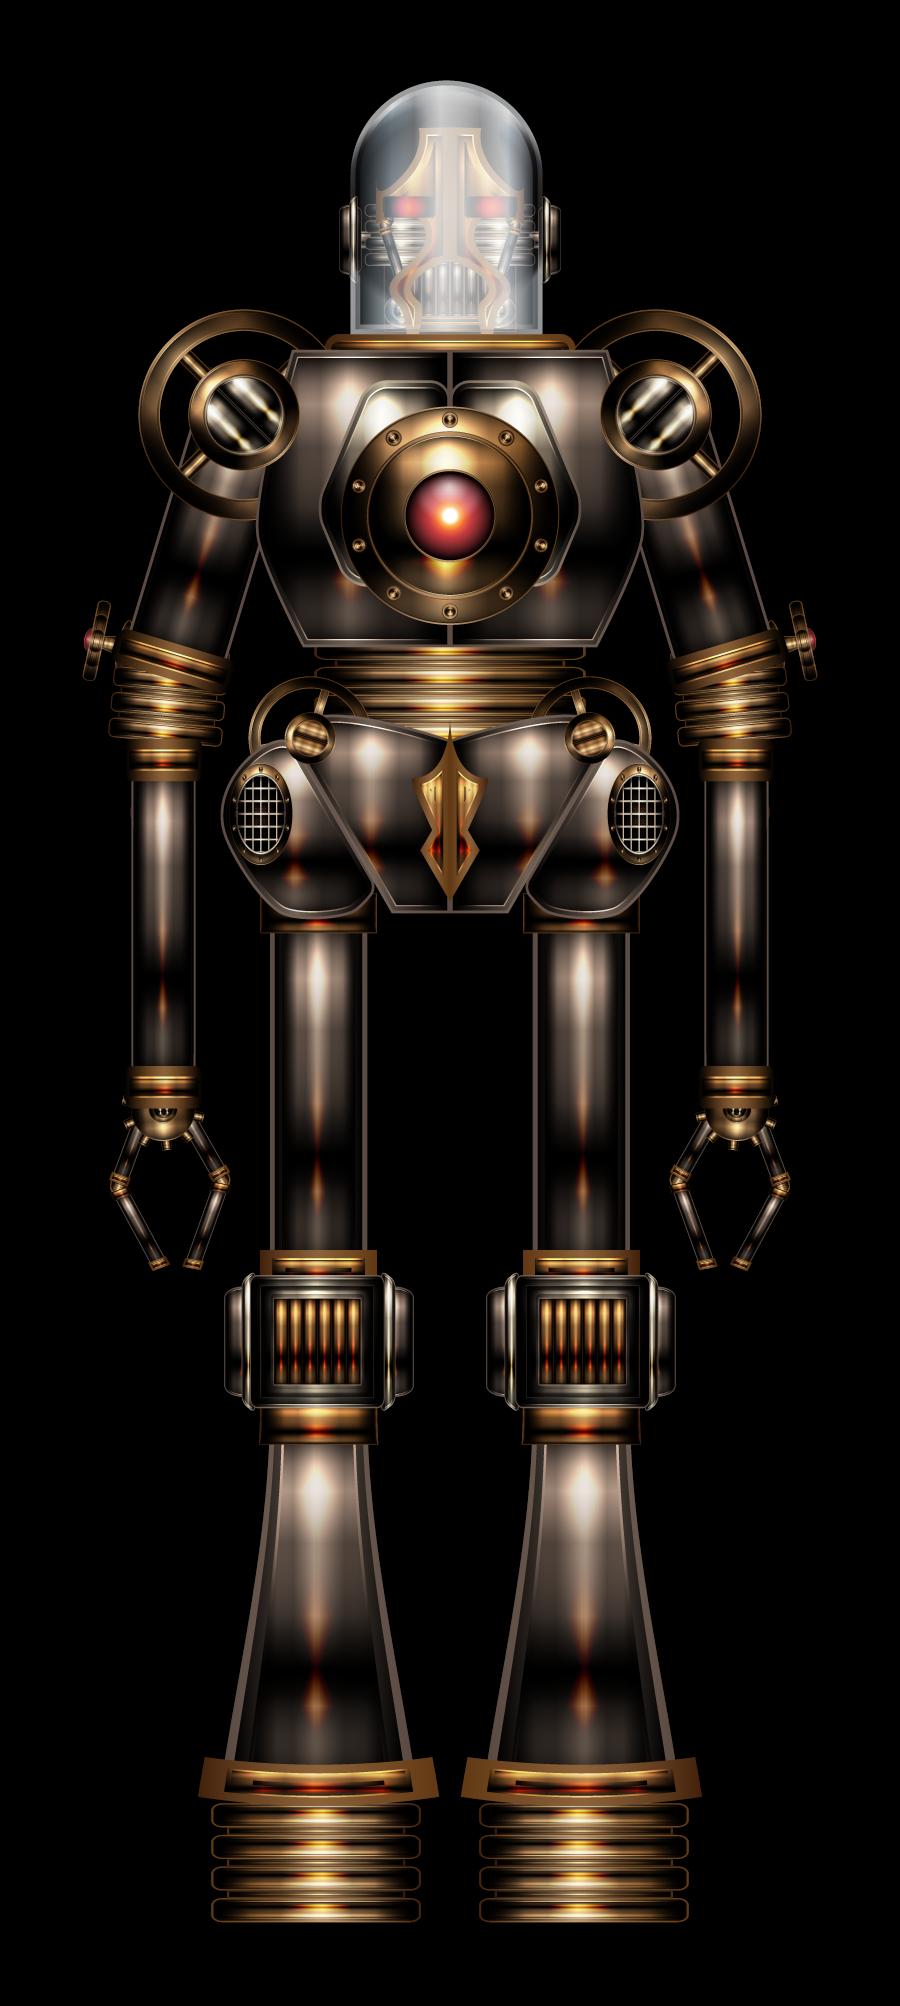 Steambot by IllustratorG